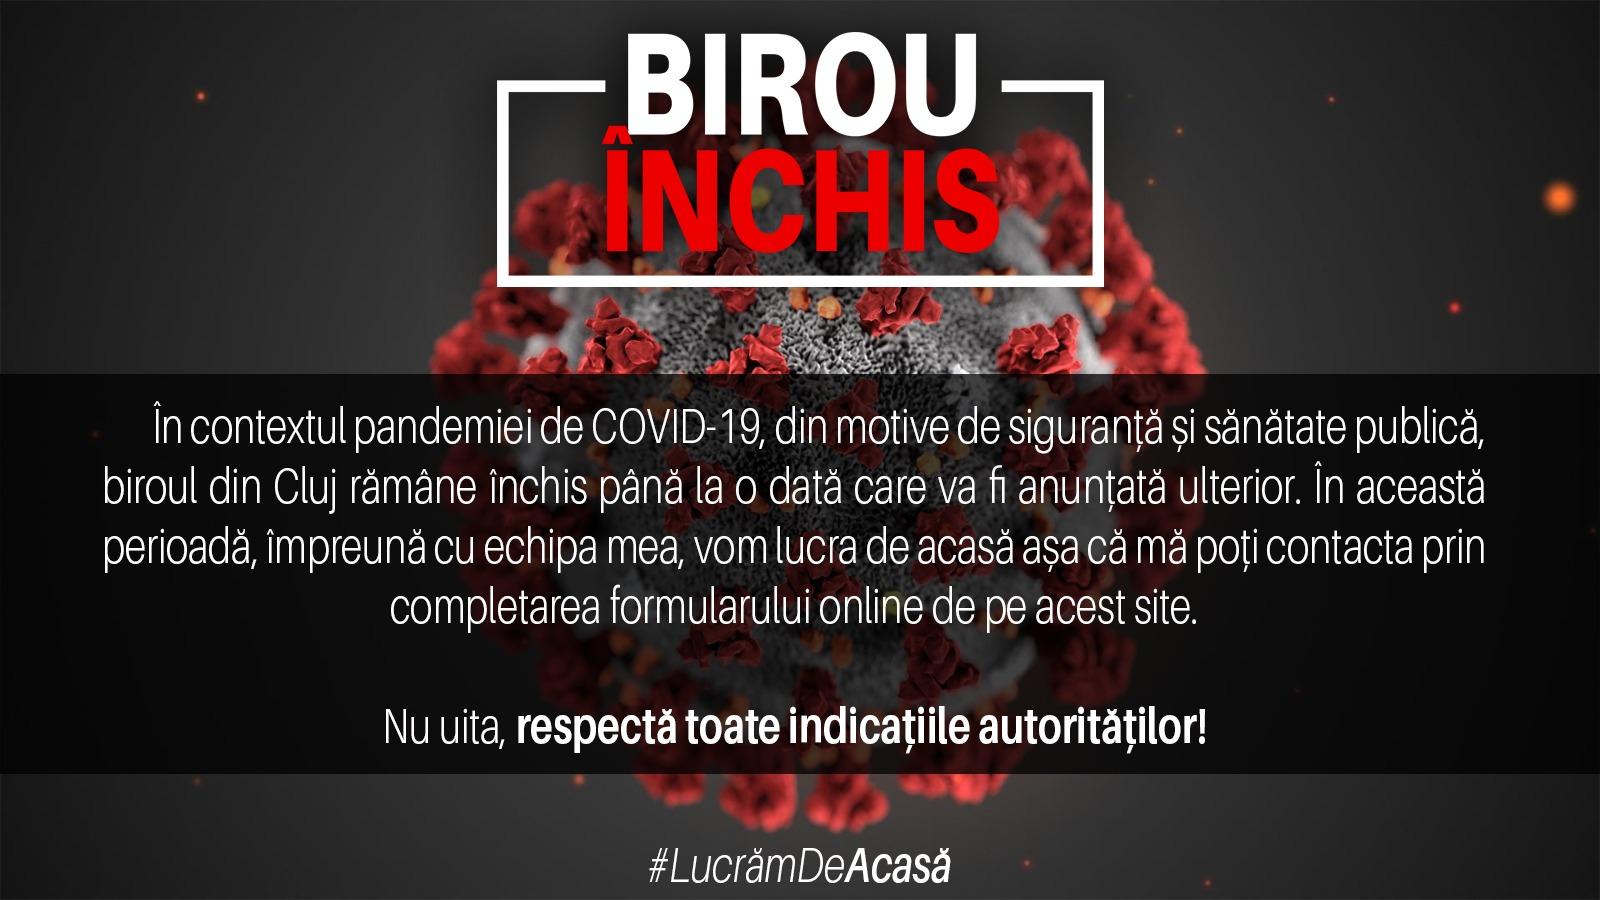 birou-inchis-sm